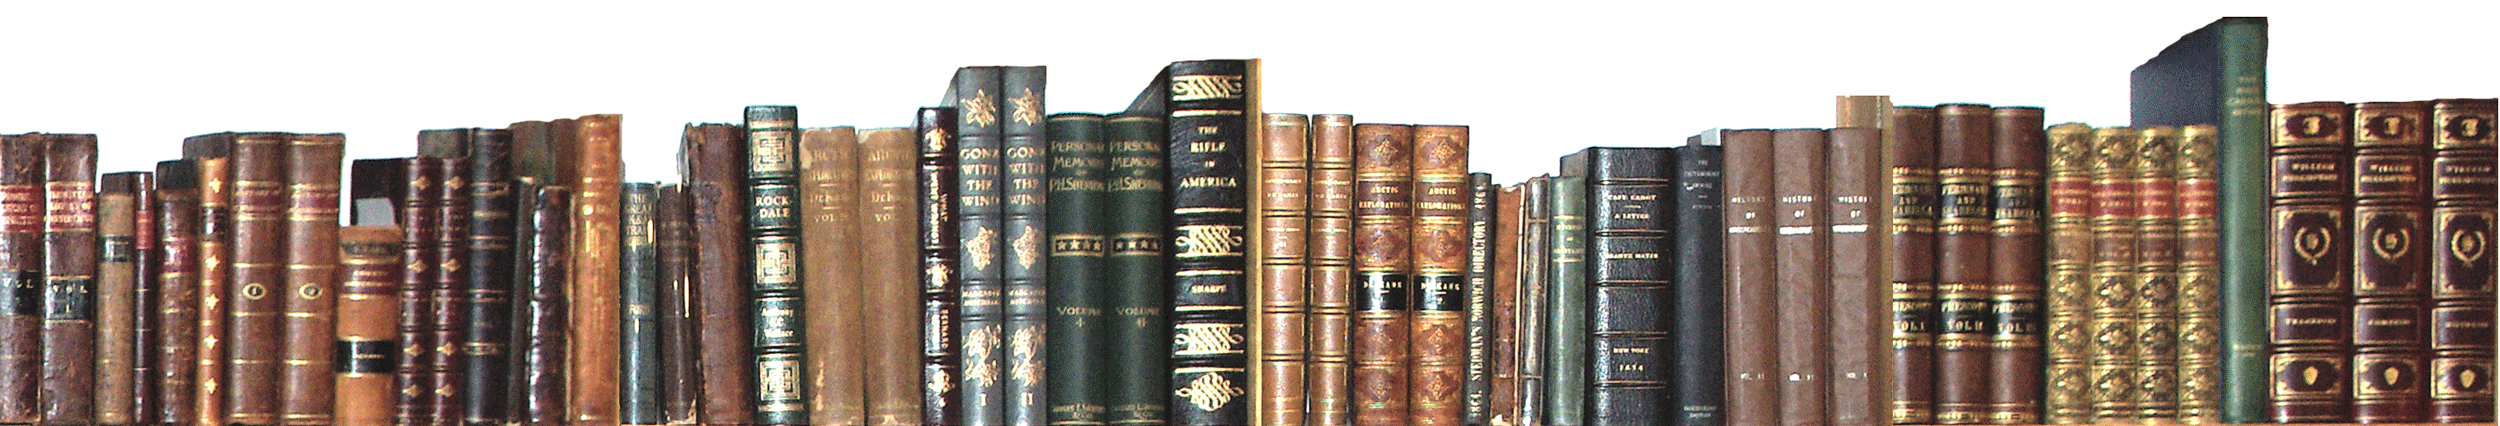 Shelf Of Antiquarian Books